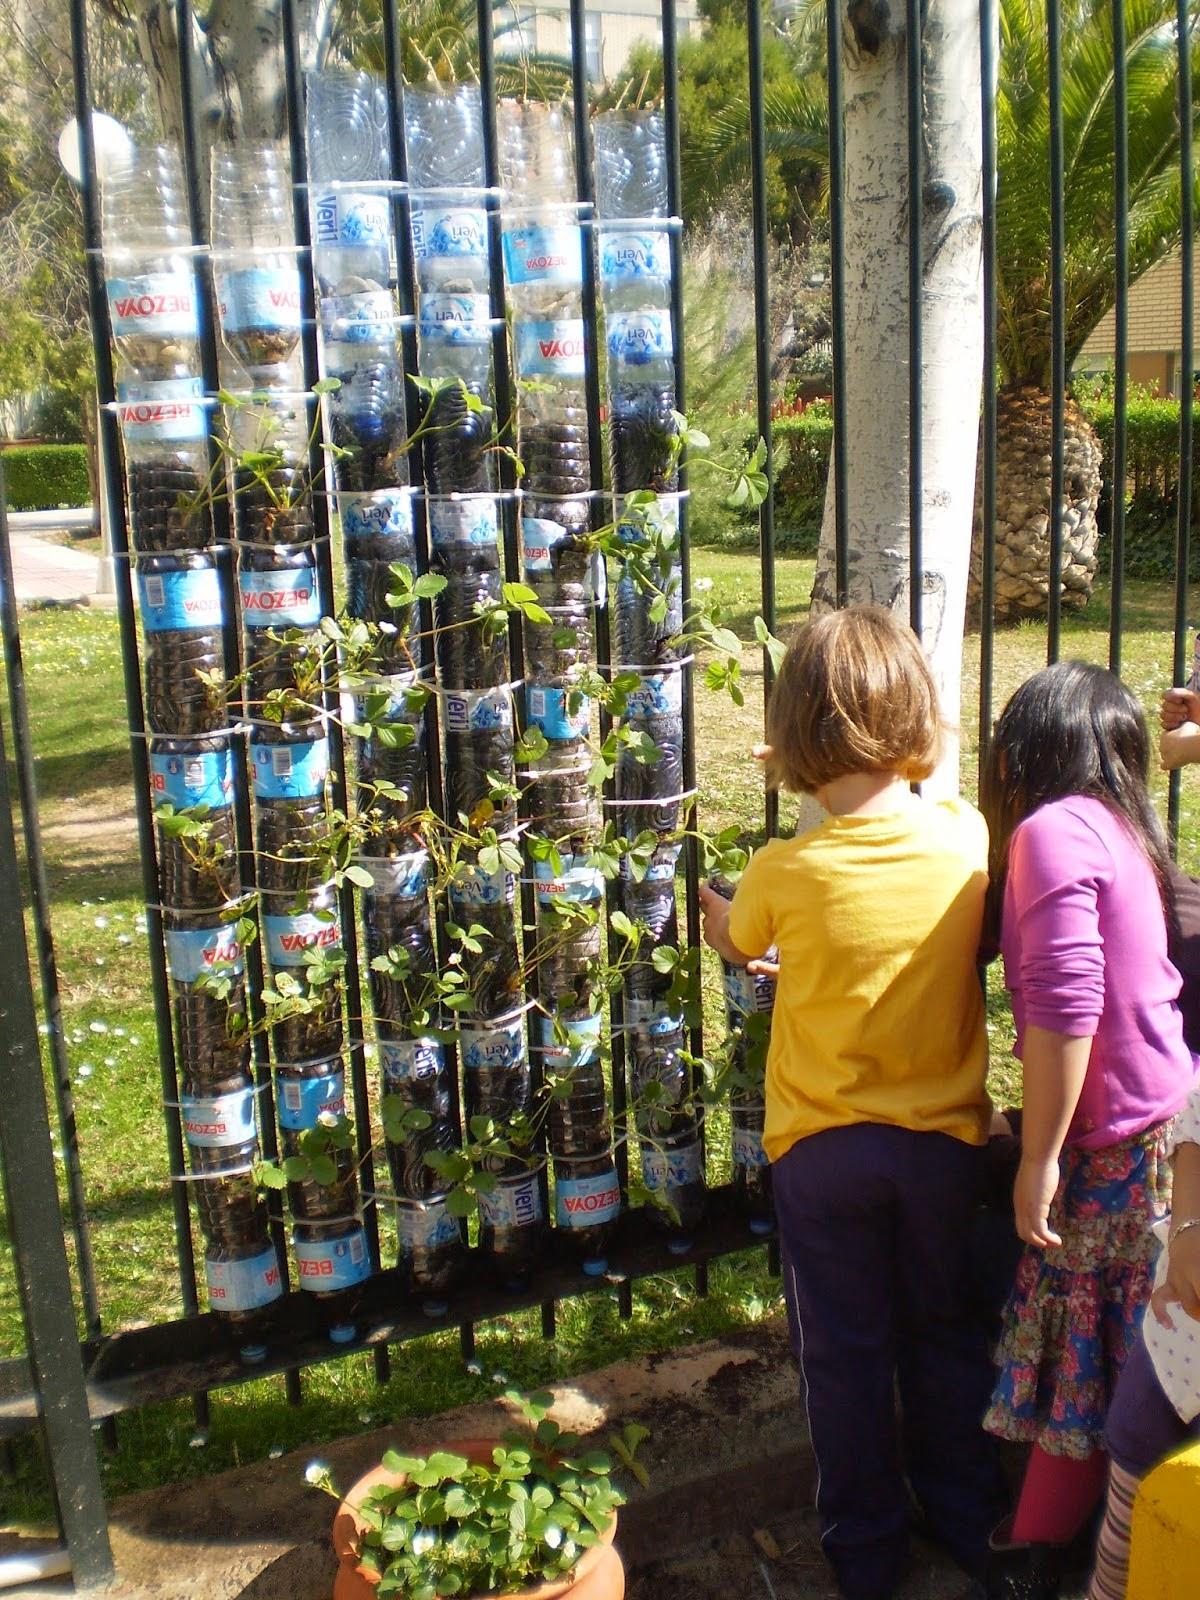 Huerto o jard n vertical for Que es un jardin vertical